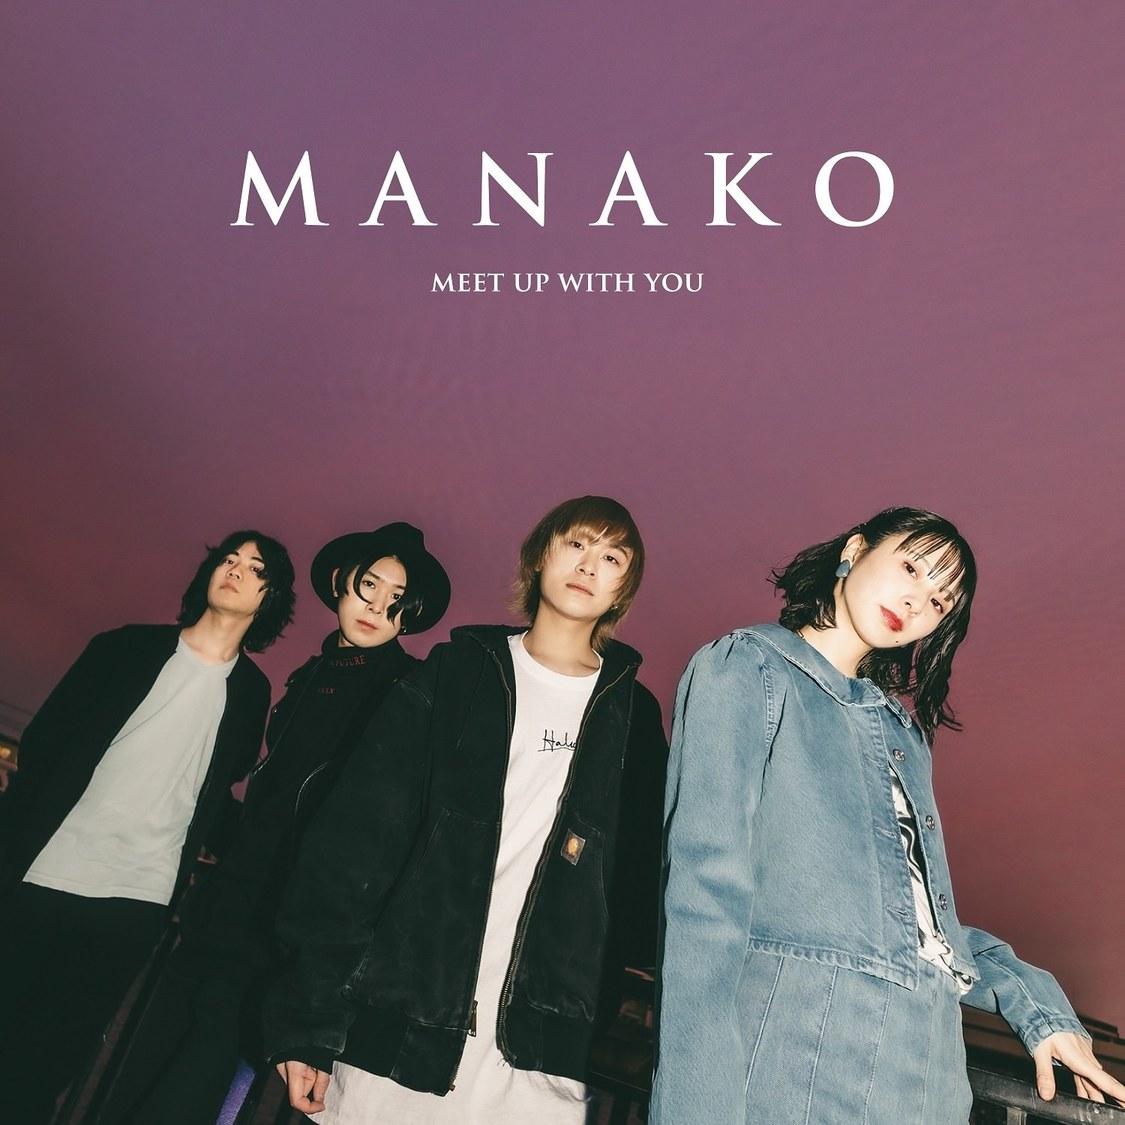 MANAKO、1st EP先行配信リリース+「ミラー」MV公開!